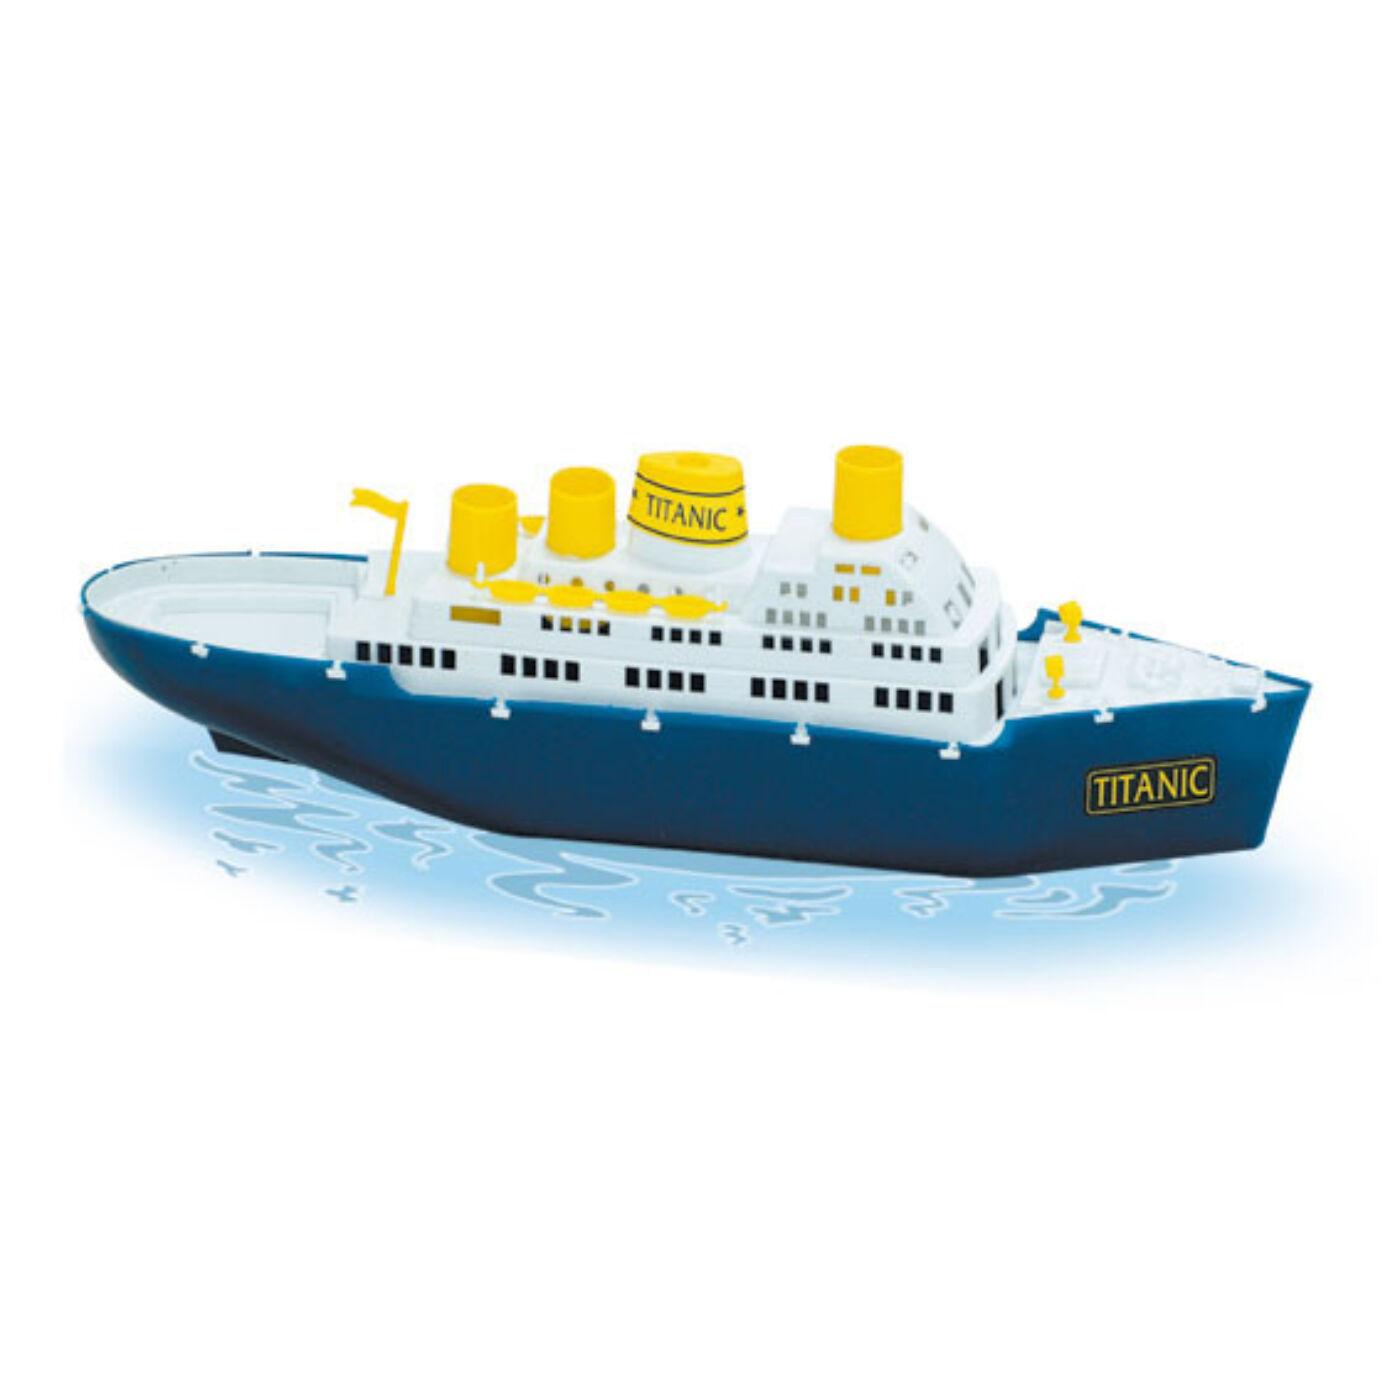 Titanic hajó